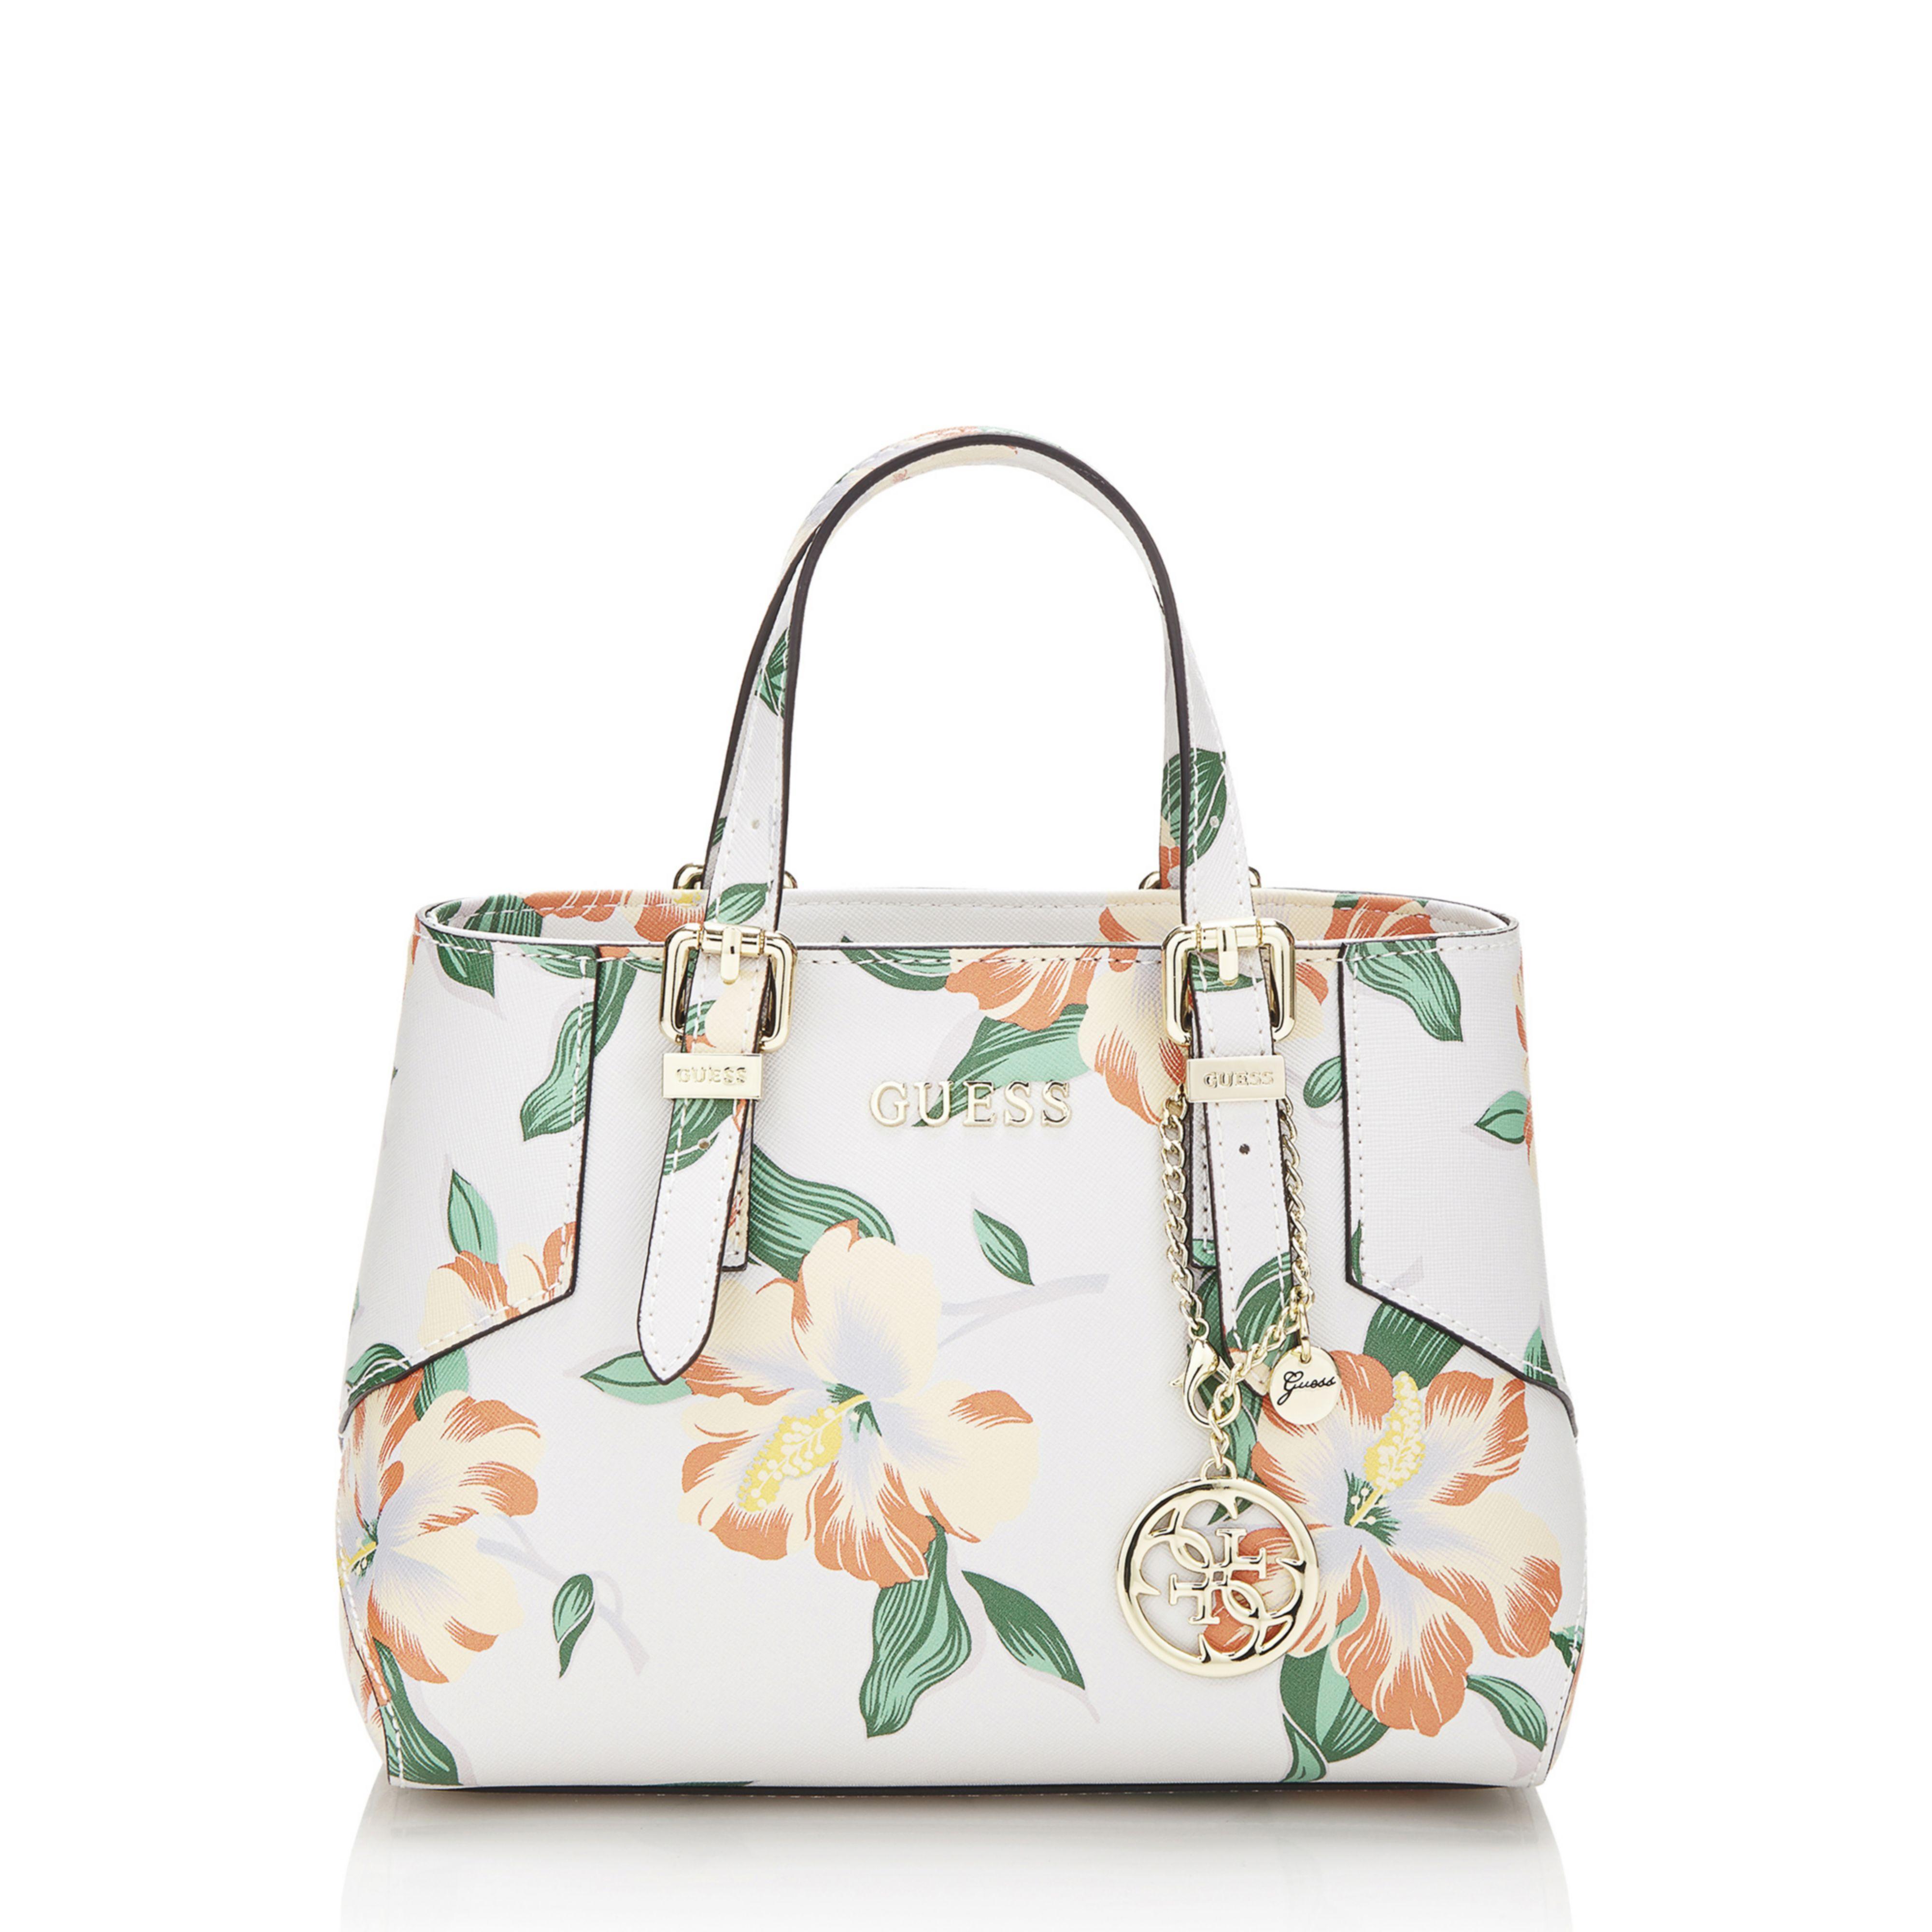 Guess Isabeau Small Floral Handbag | Lyst